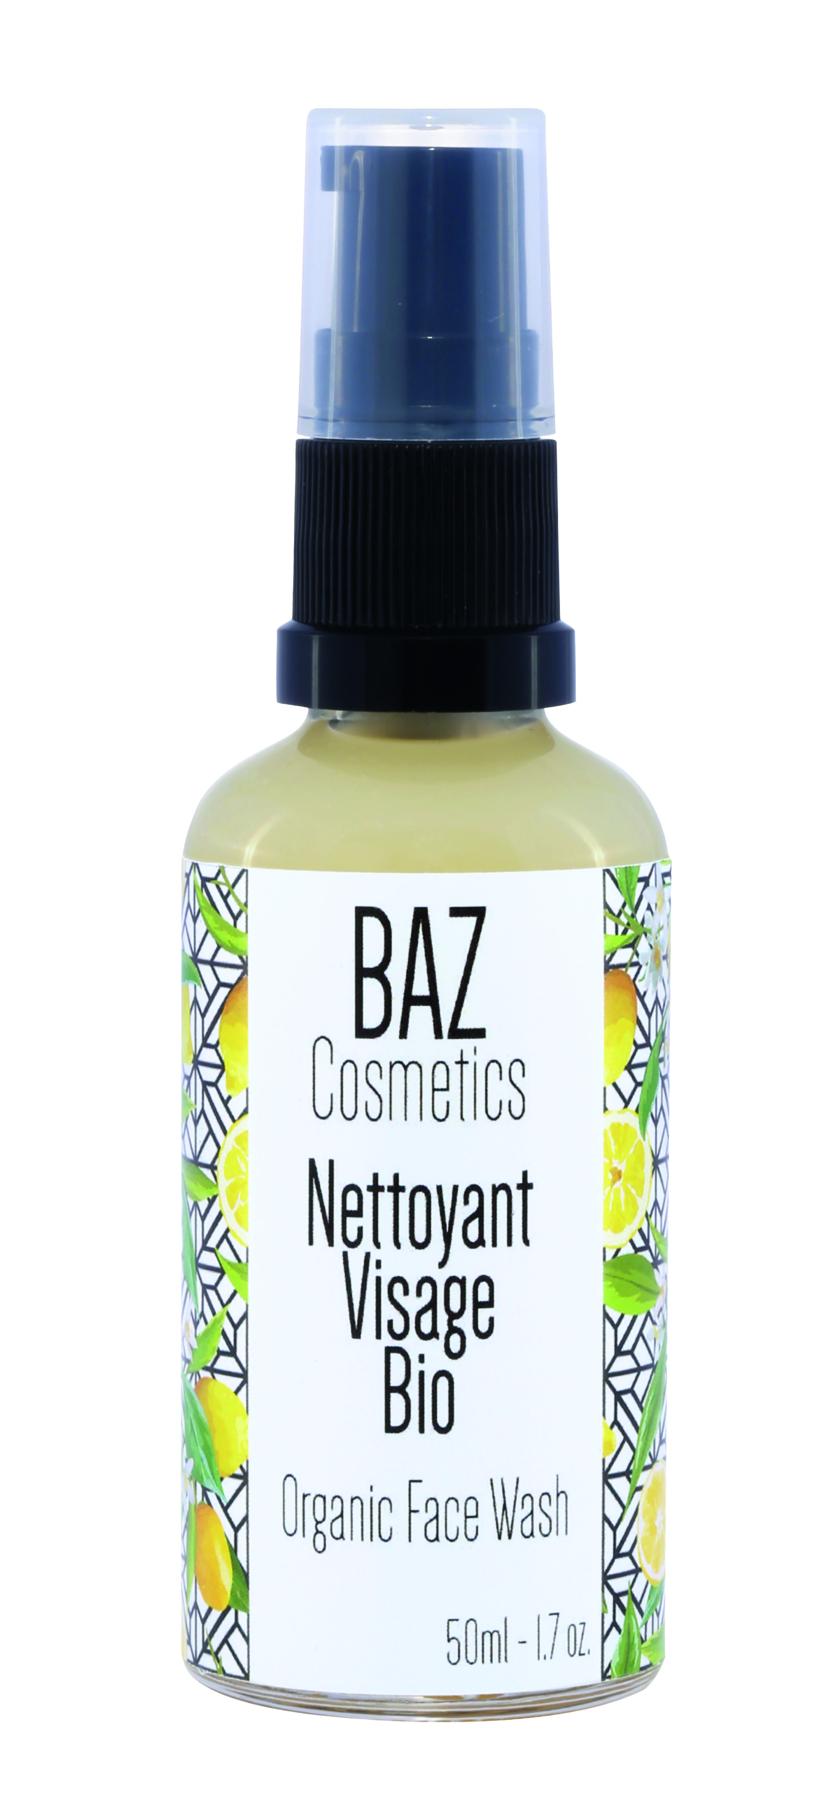 Doux Good - BAZ Cosmetics - Nettoyant Visage Bio